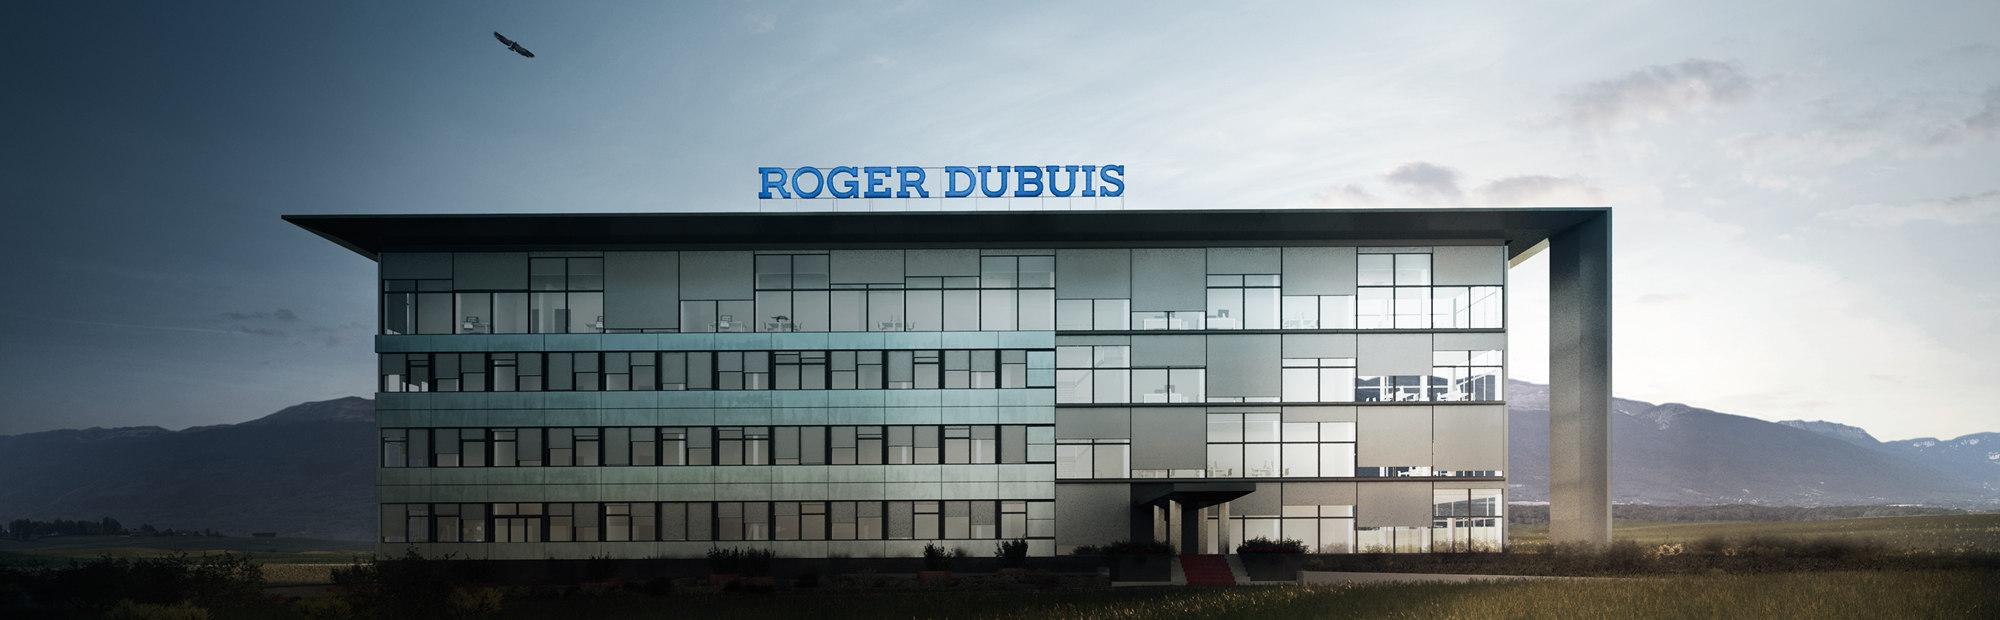 Roger Dubuis Macau